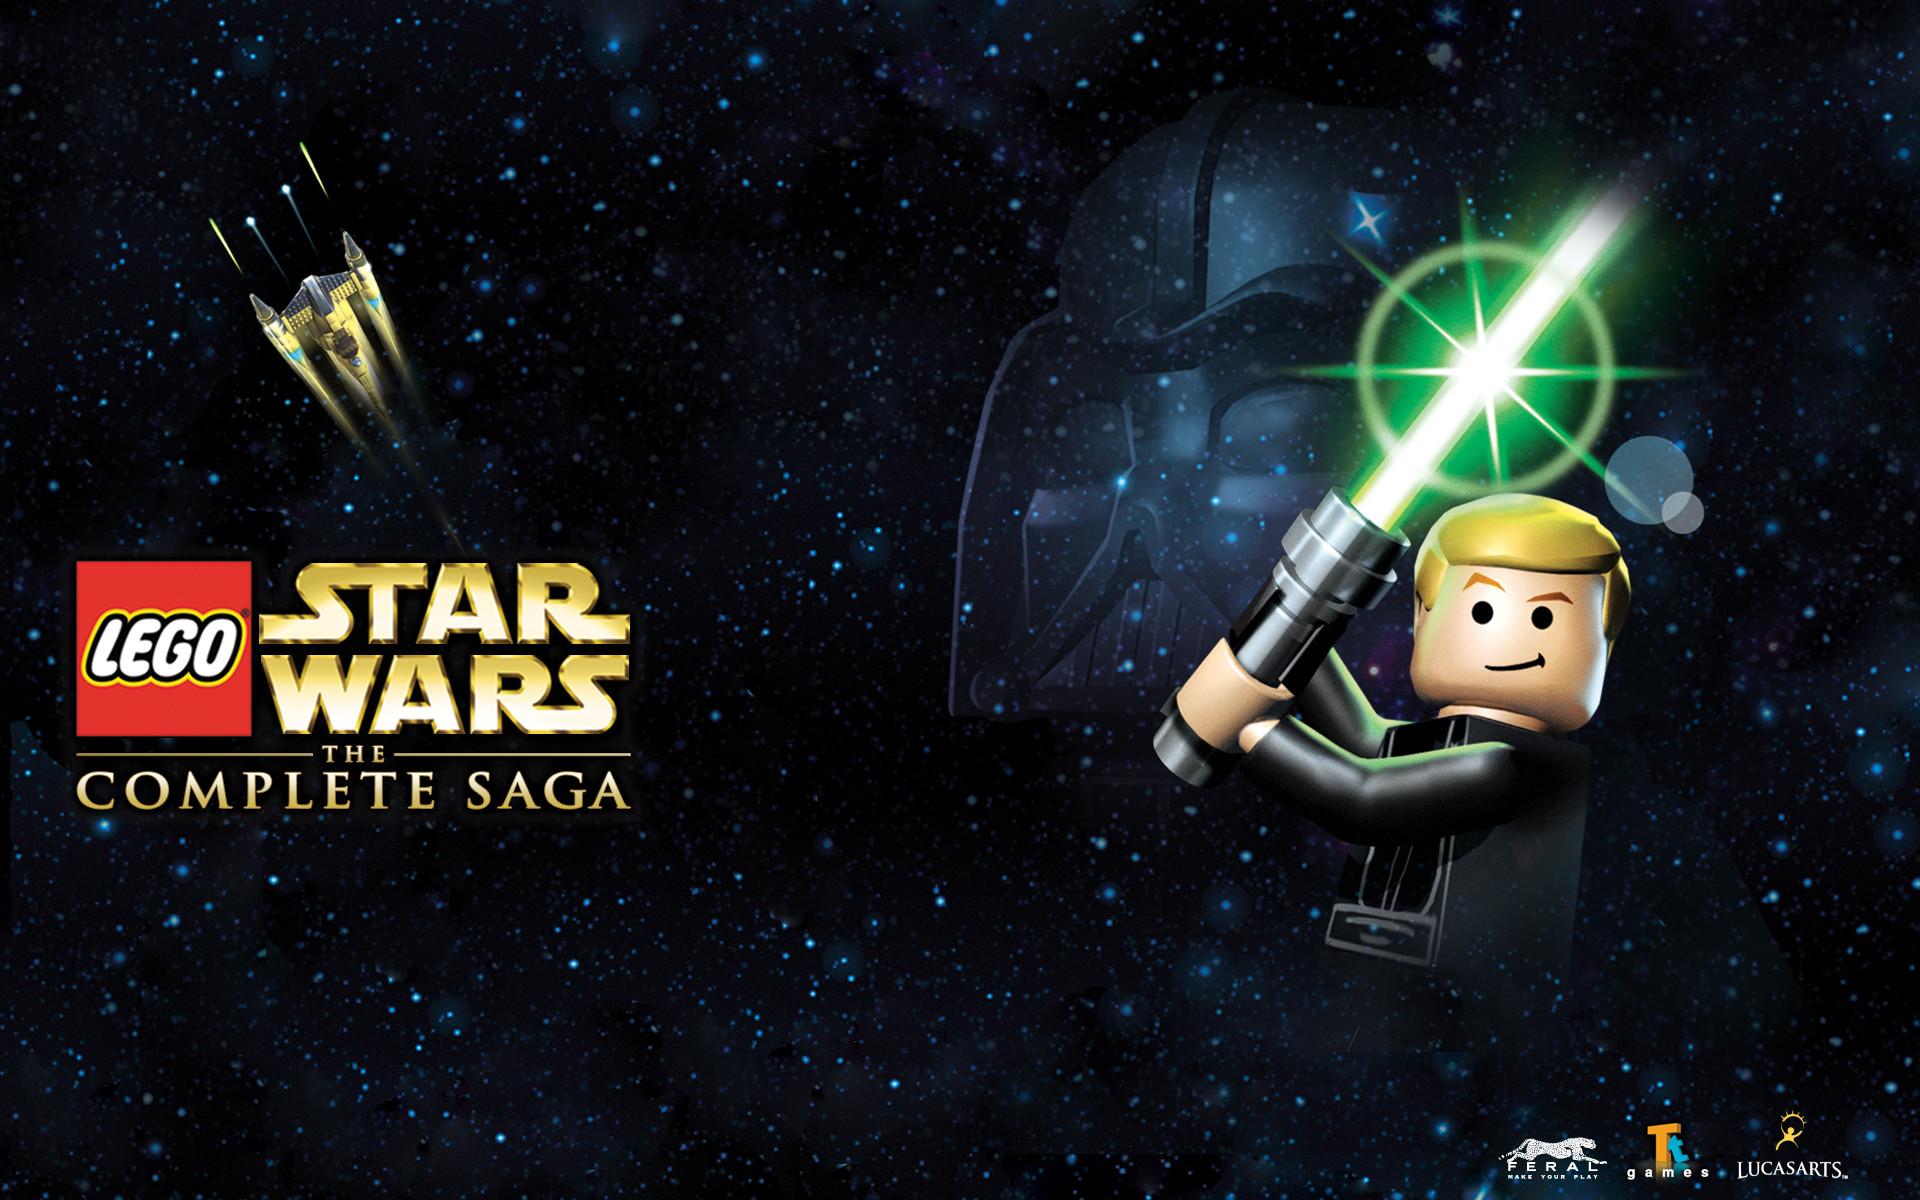 Lego Star Wars Wallpaper (69+ images)